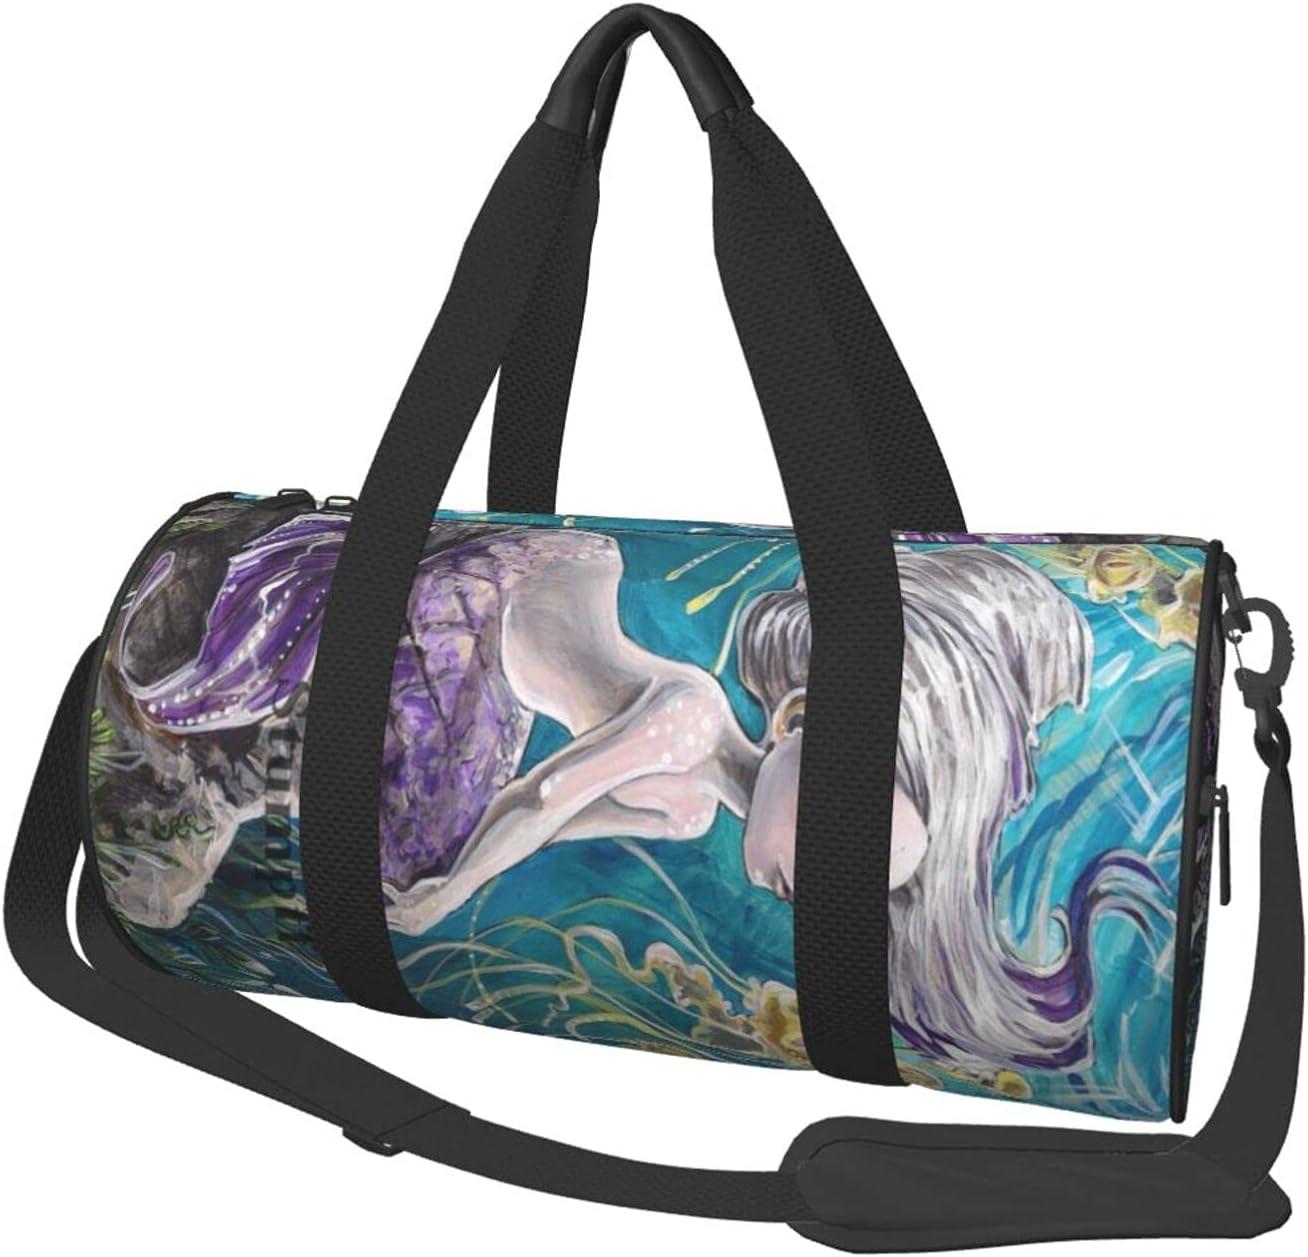 NCHOME Duffel Bag Purple Mermaid Roll Super special Max 67% OFF price Unique Travel W